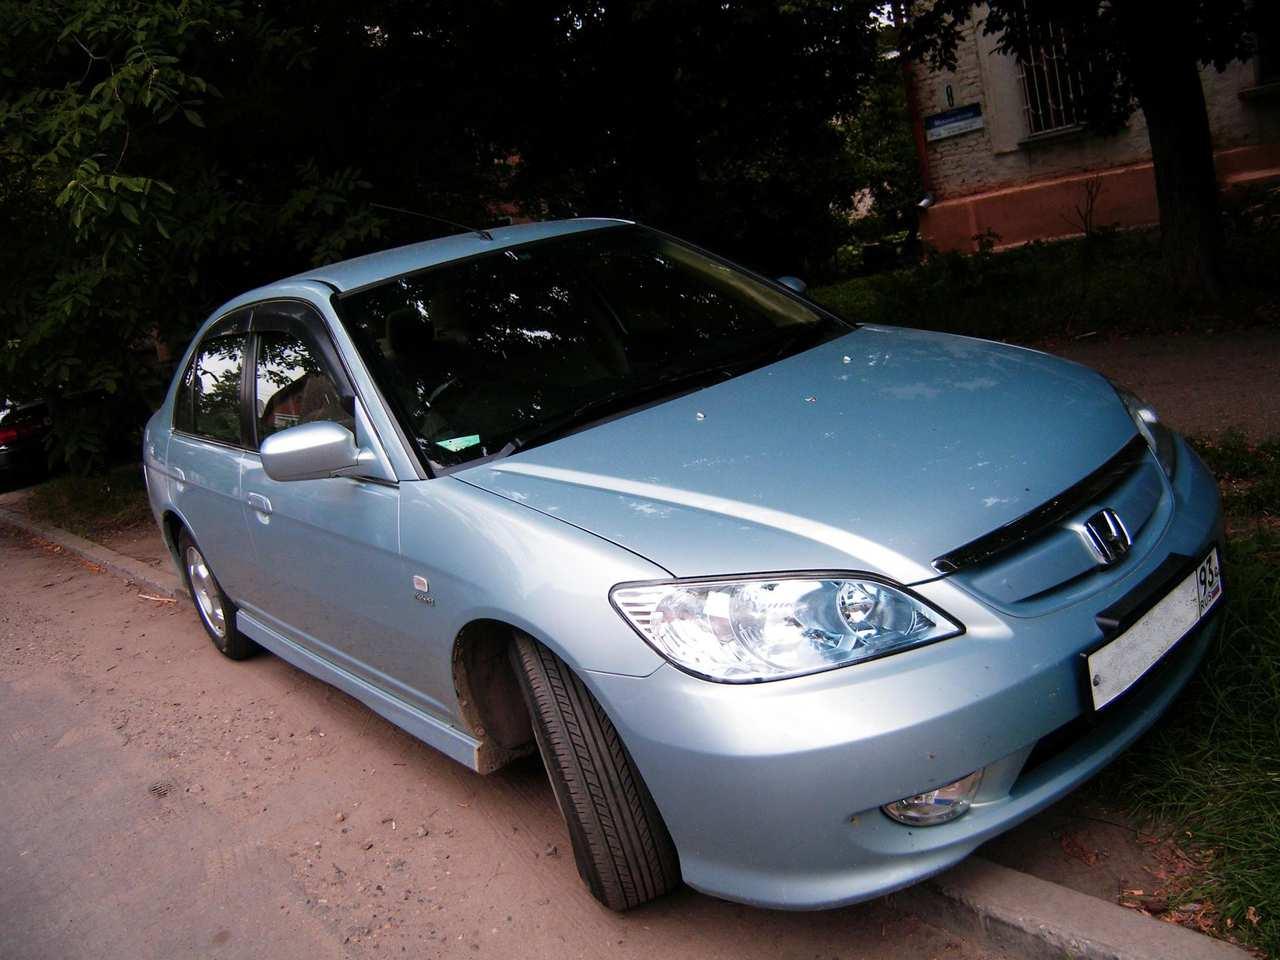 2004 Honda Civic Hybrid Wallpapers, 1.3l., FF, CVT For Sale